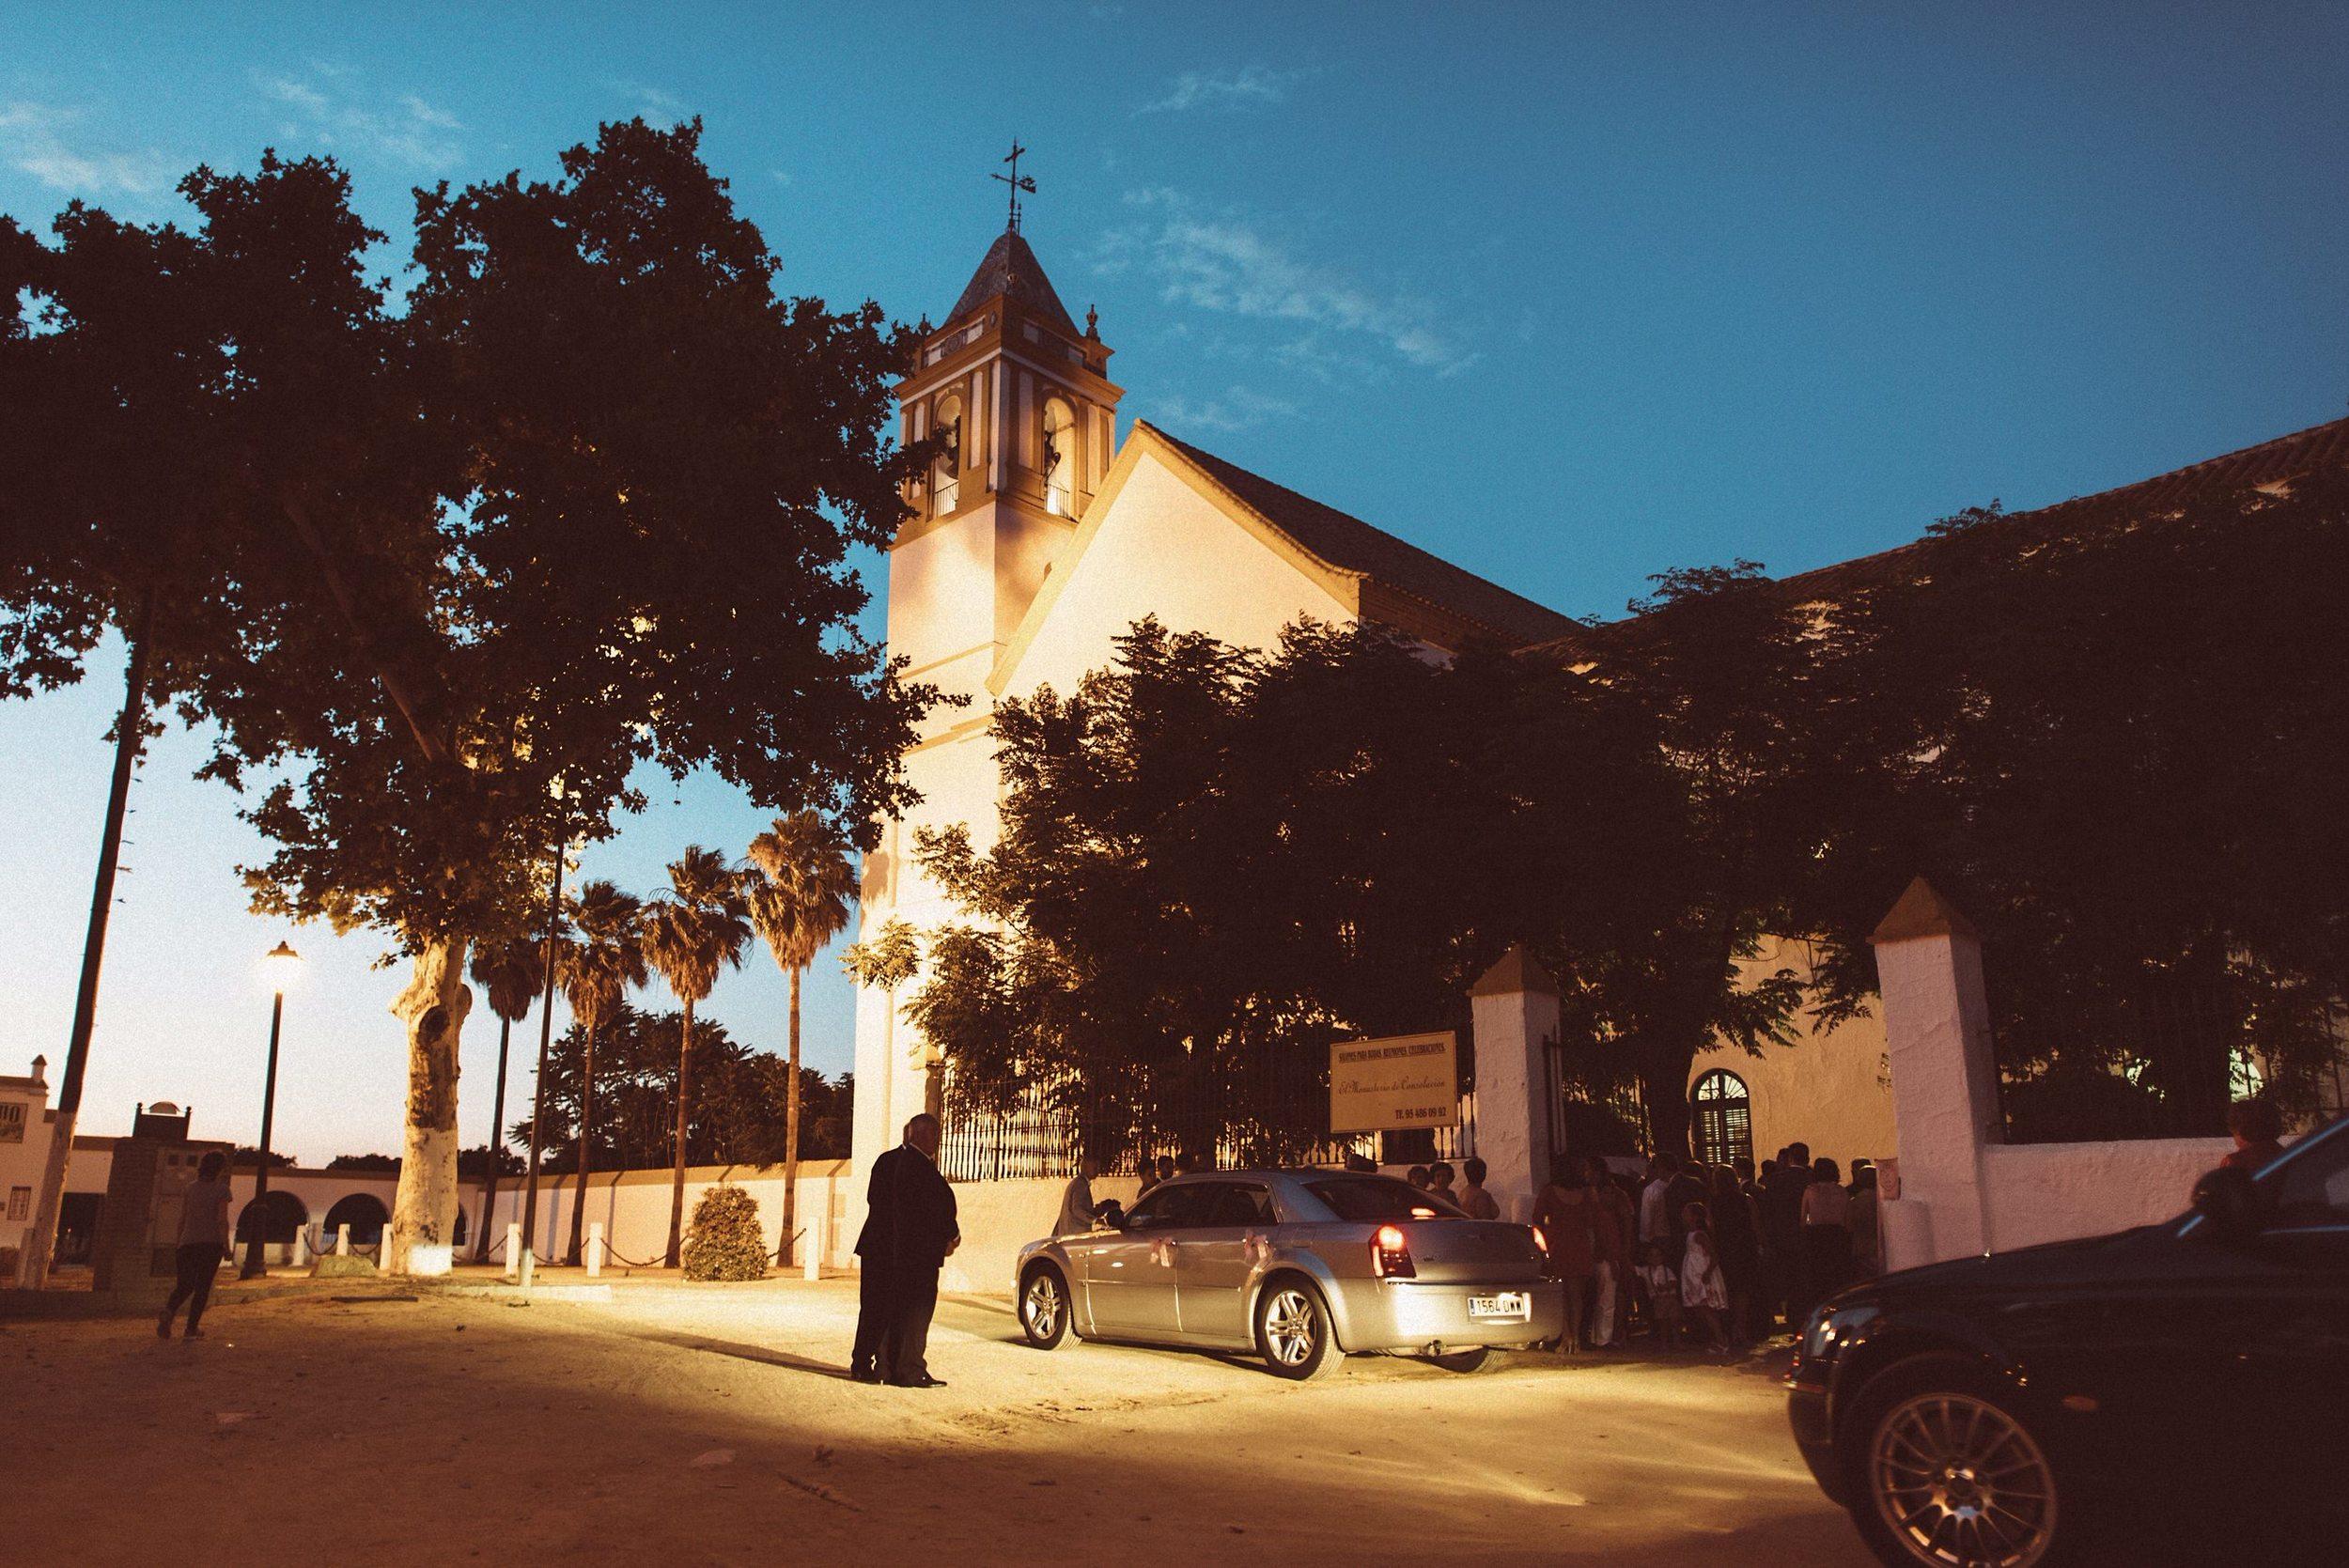 Boda en Utrera - Sevilla - Consolacion - Santuario - Alicia & Jesus DSC_4594exposure.jpg